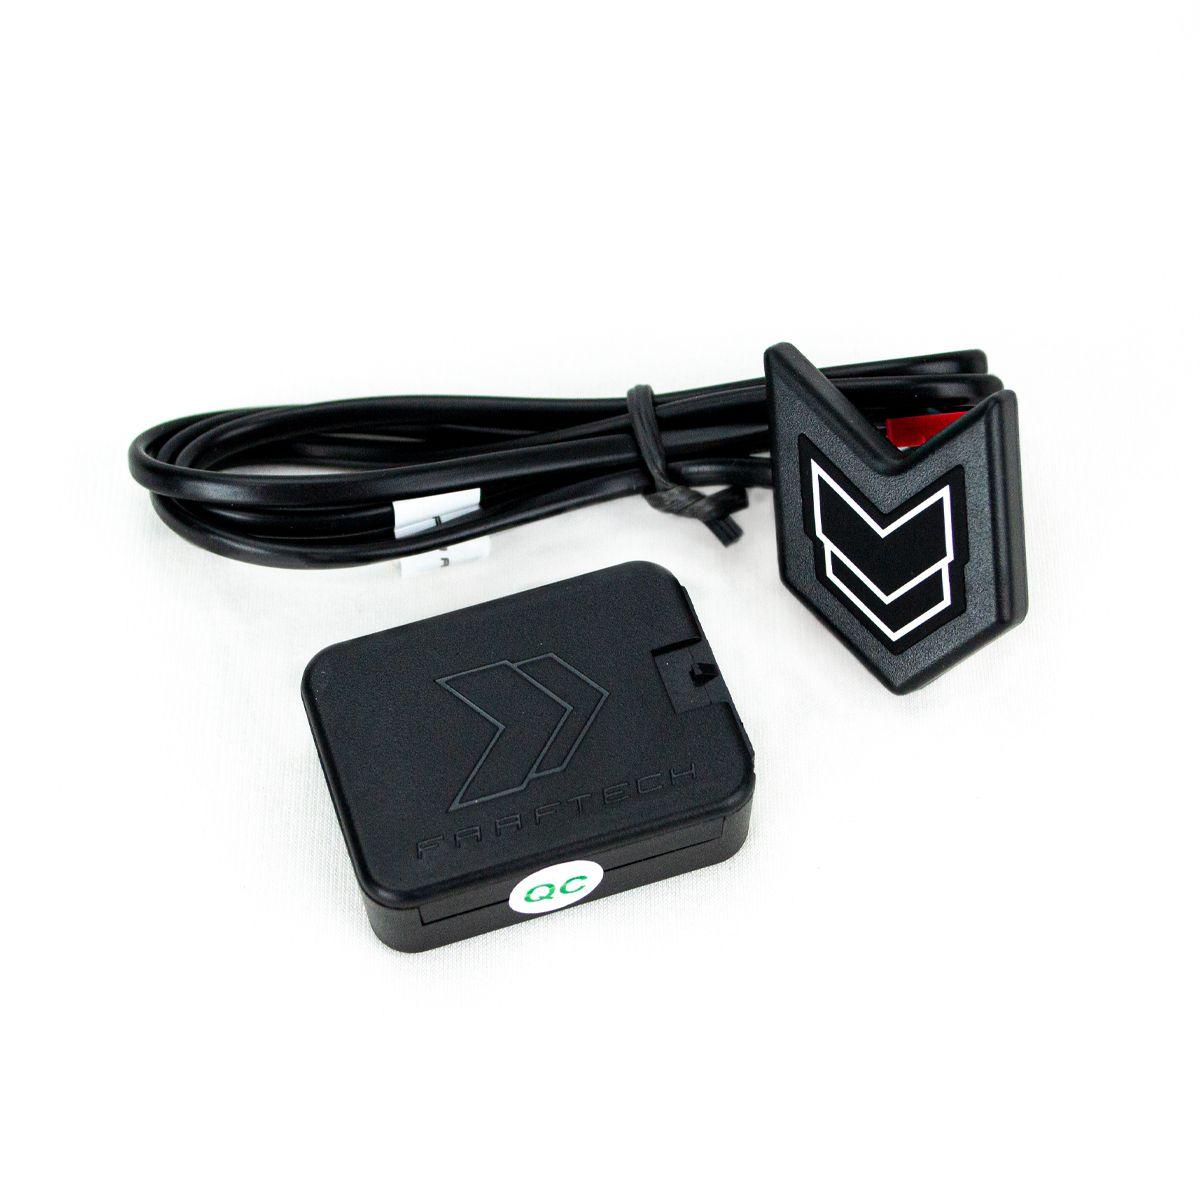 Chip de Pedal Shiftpower Para  Jeep Compass